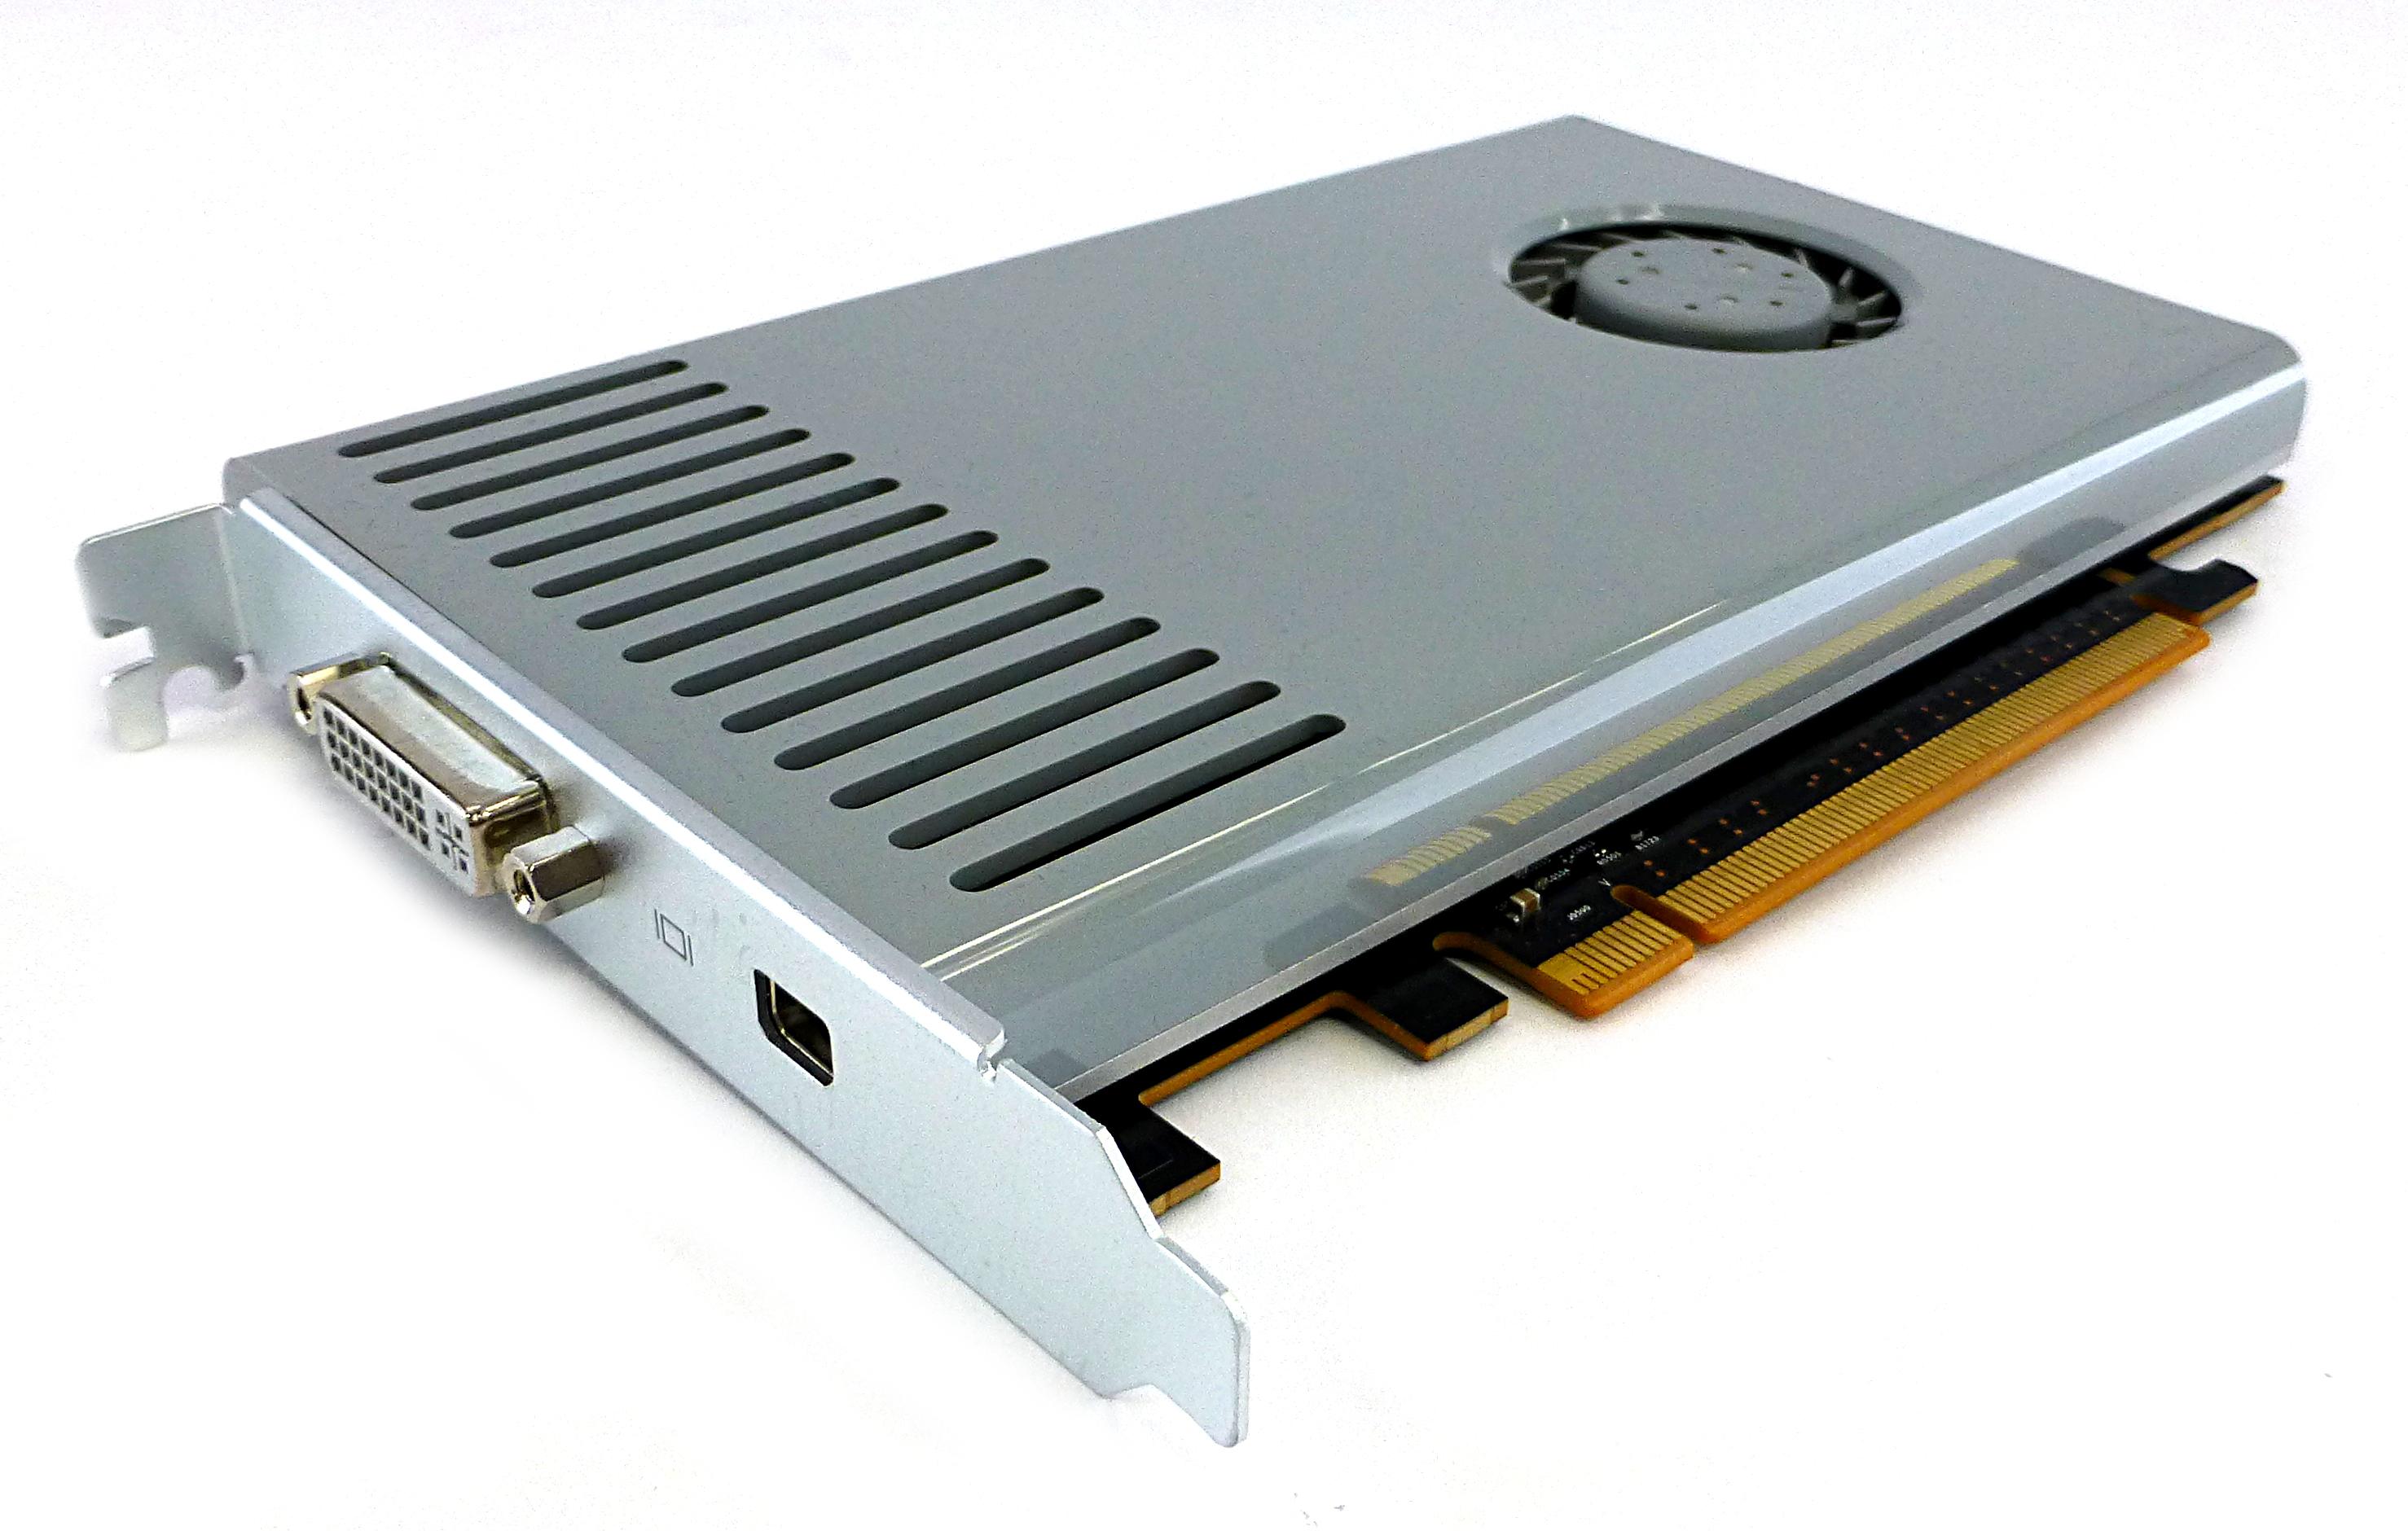 Apple 630-9643 A1310 GeForce GT120 512MB GDDR3 PCI-e MiniDP/DVI Graphics Card